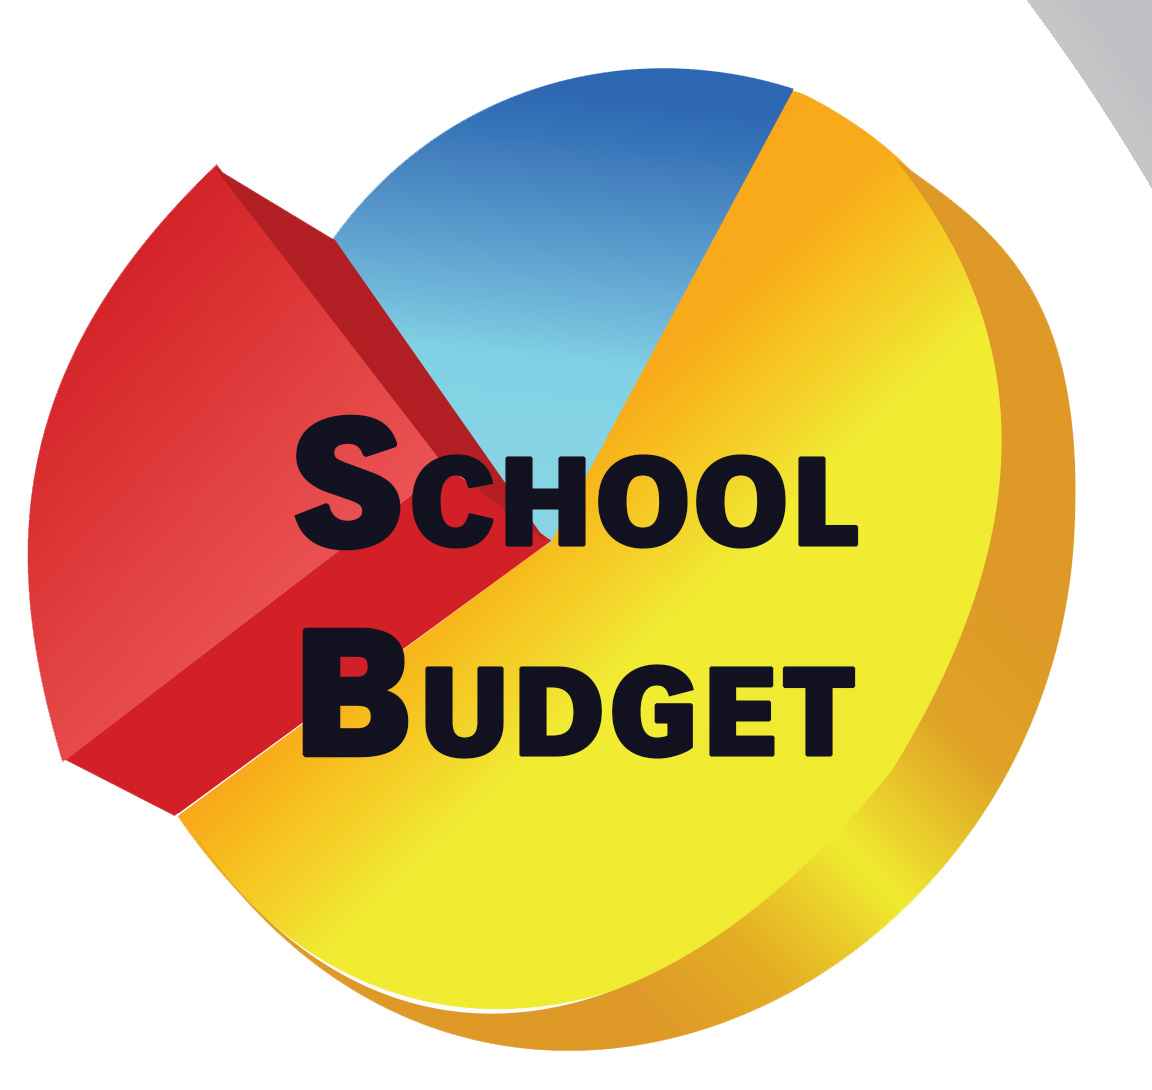 Budget clipart school budget, Budget school budget Transparent FREE for  download on WebStockReview 2020